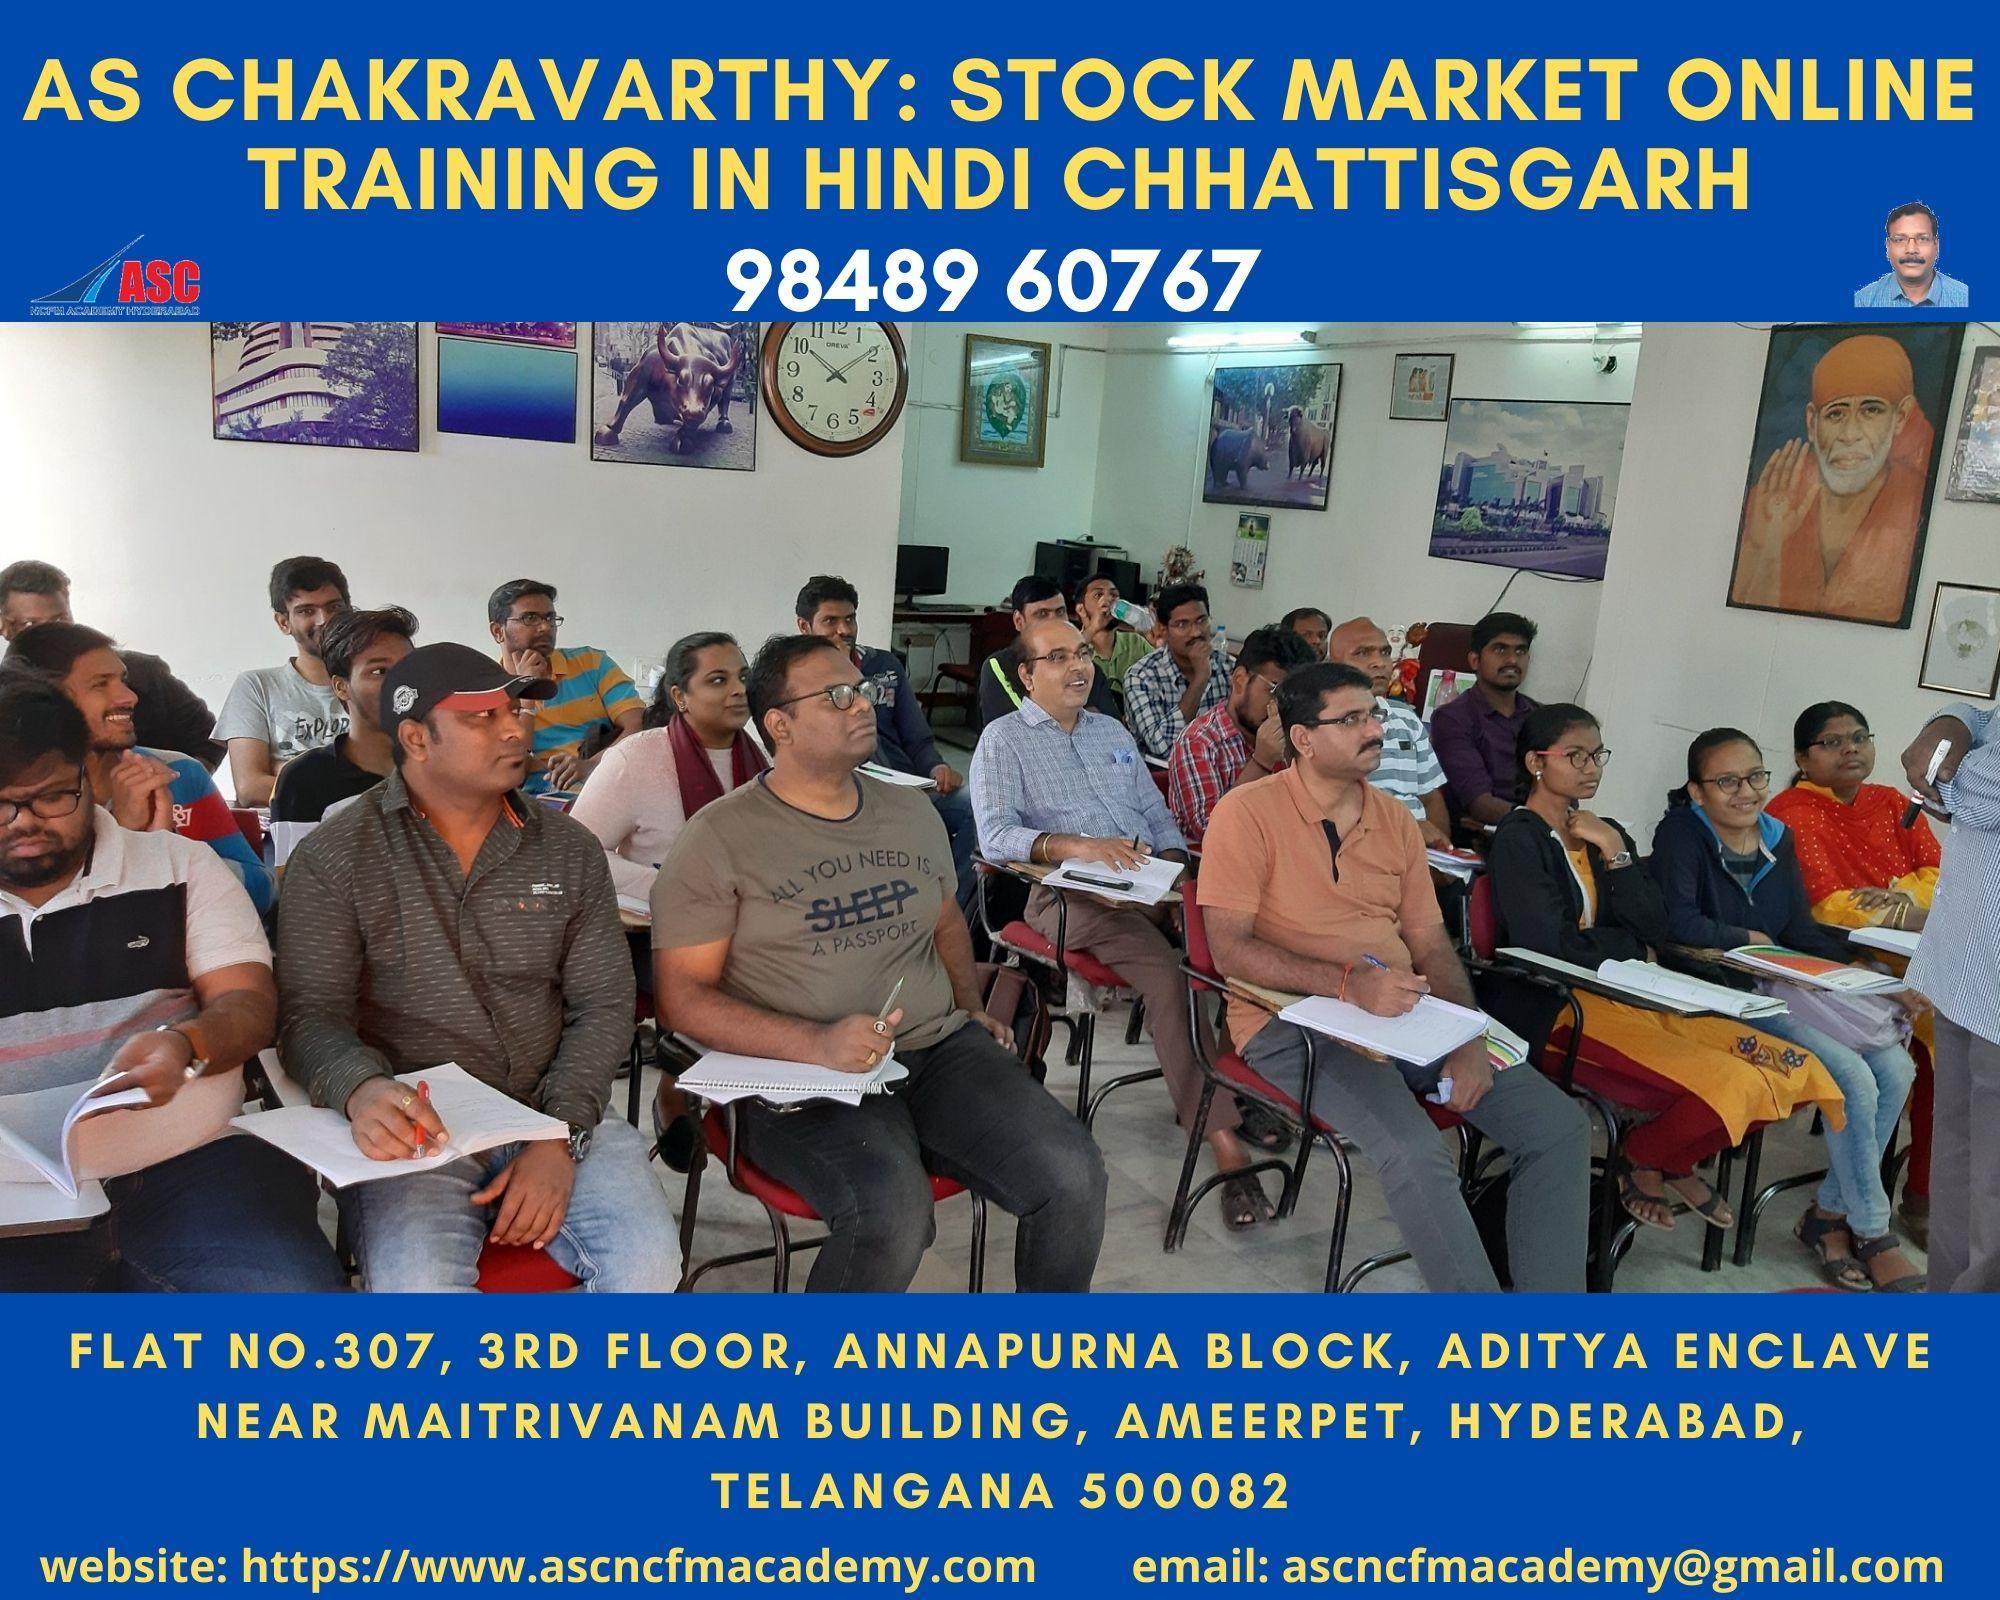 Online Stock Market Technical Training in Hindi Chhattisgarh